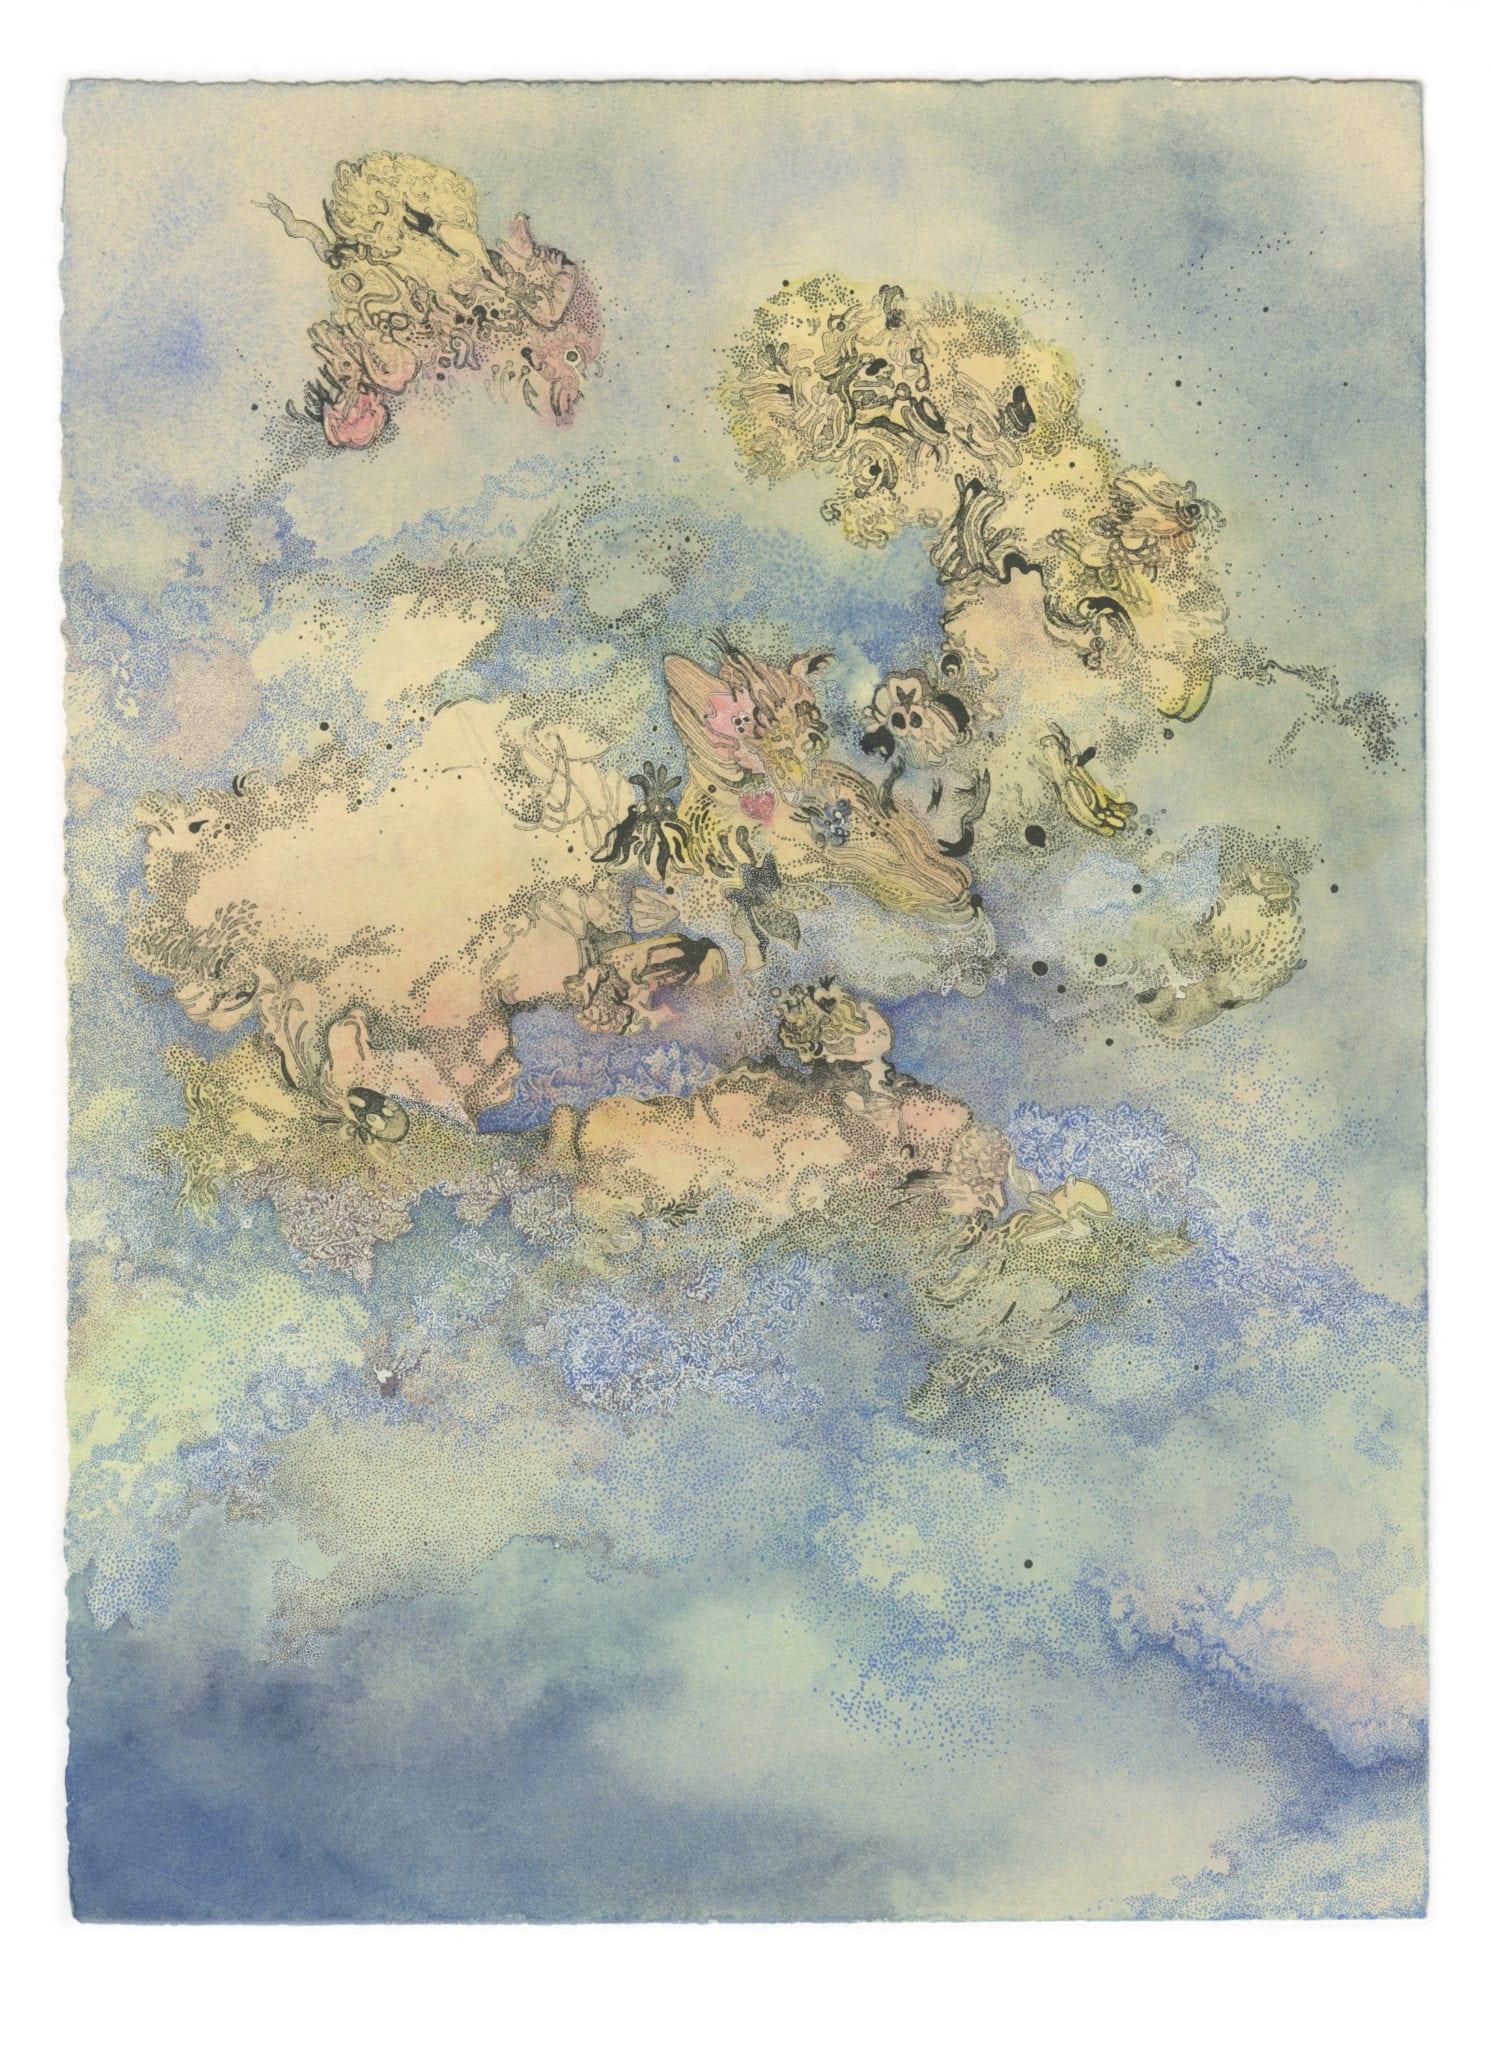 Hannah Adair, Columbine (Aqueligea), lithography, pen, ink watercolor.